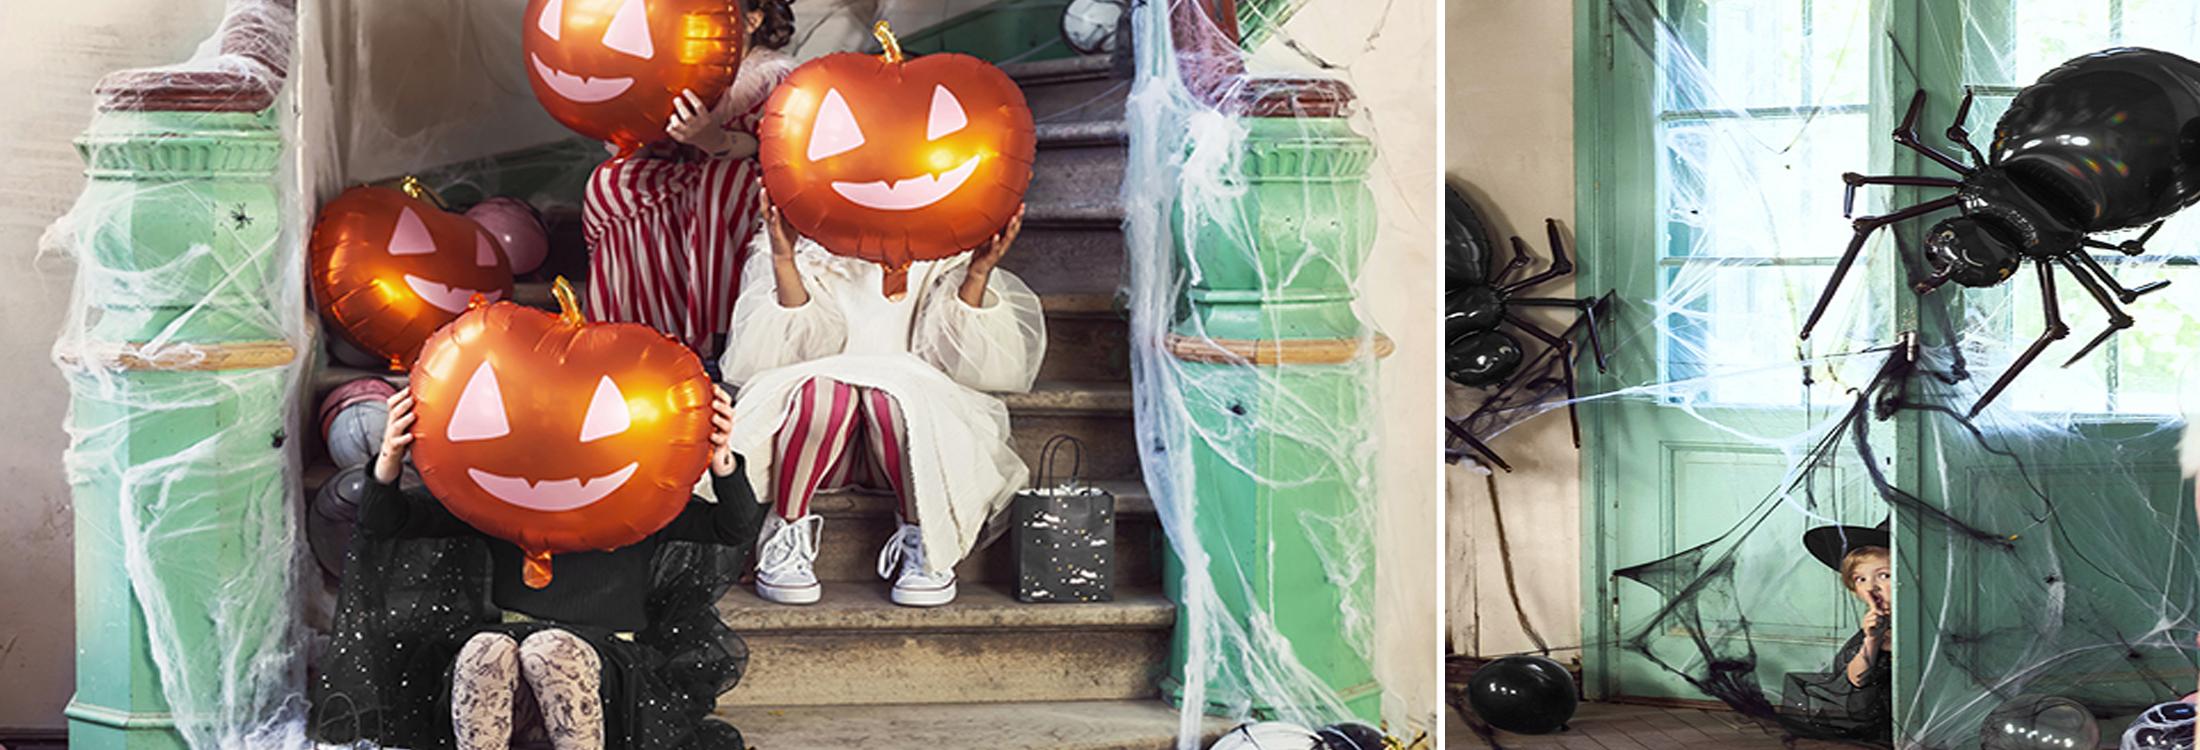 i-Presents Halloween